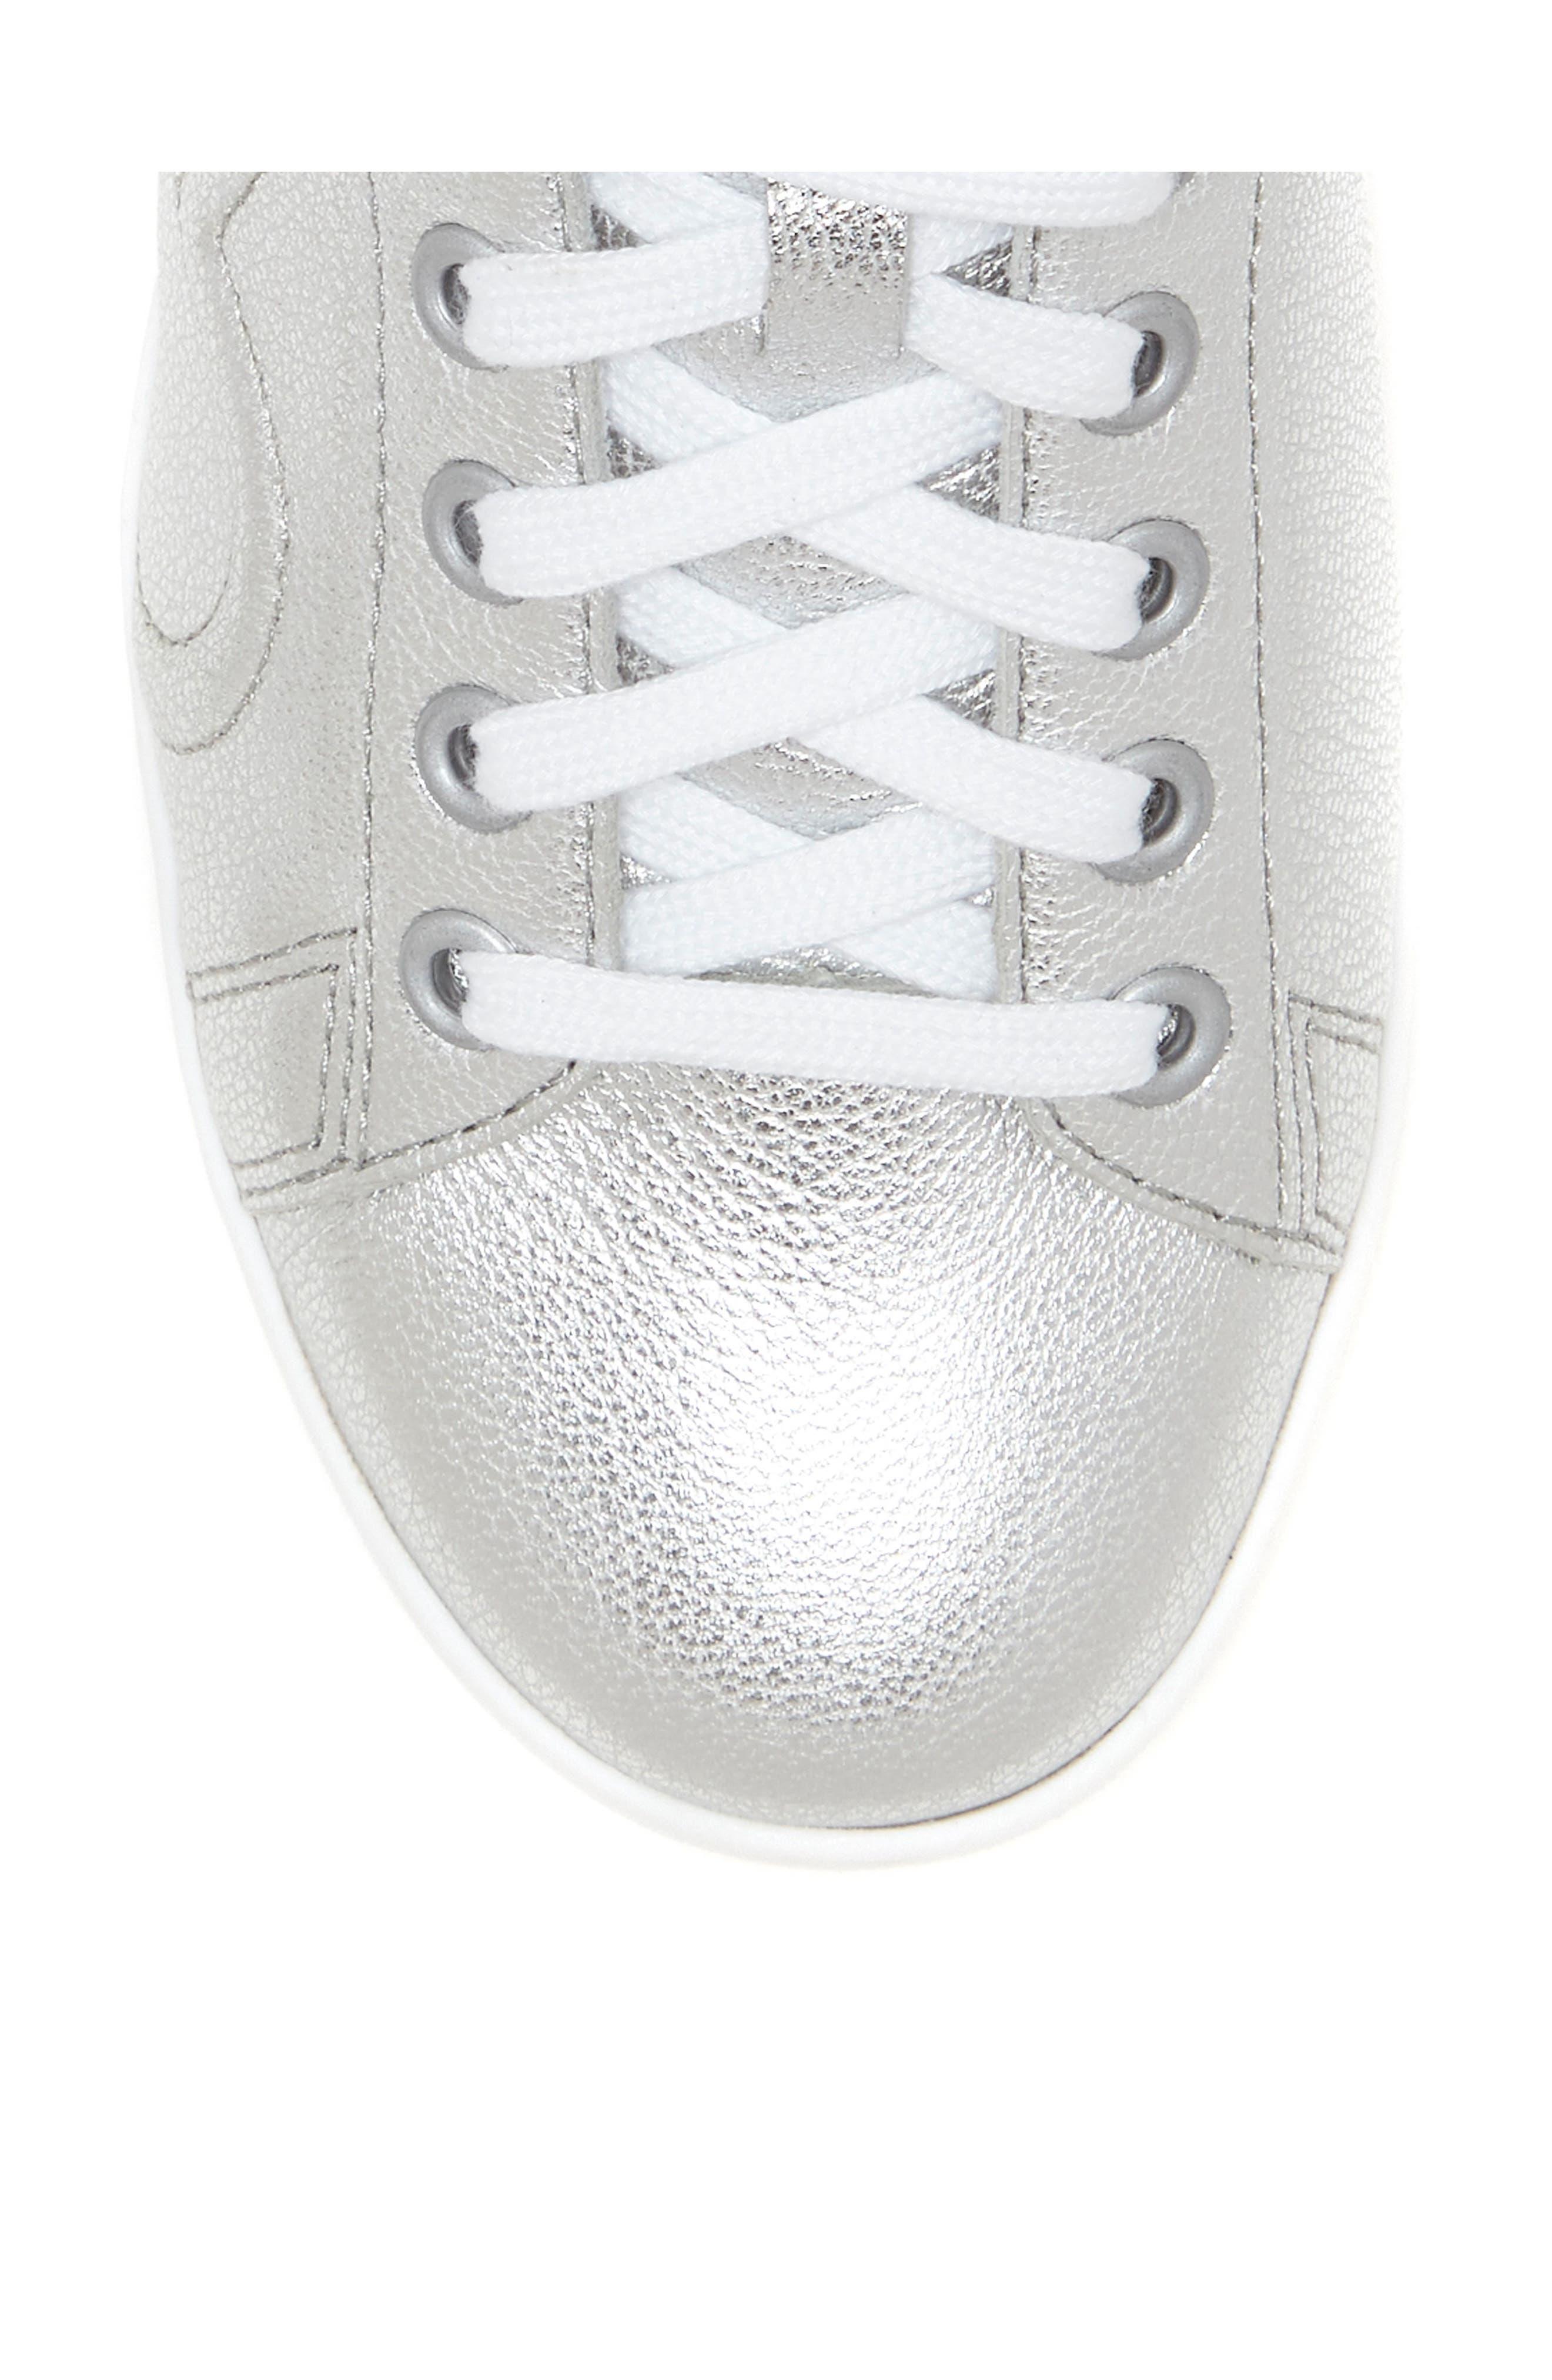 Chapunto Sneaker,                             Alternate thumbnail 5, color,                             SILVER SUEDE